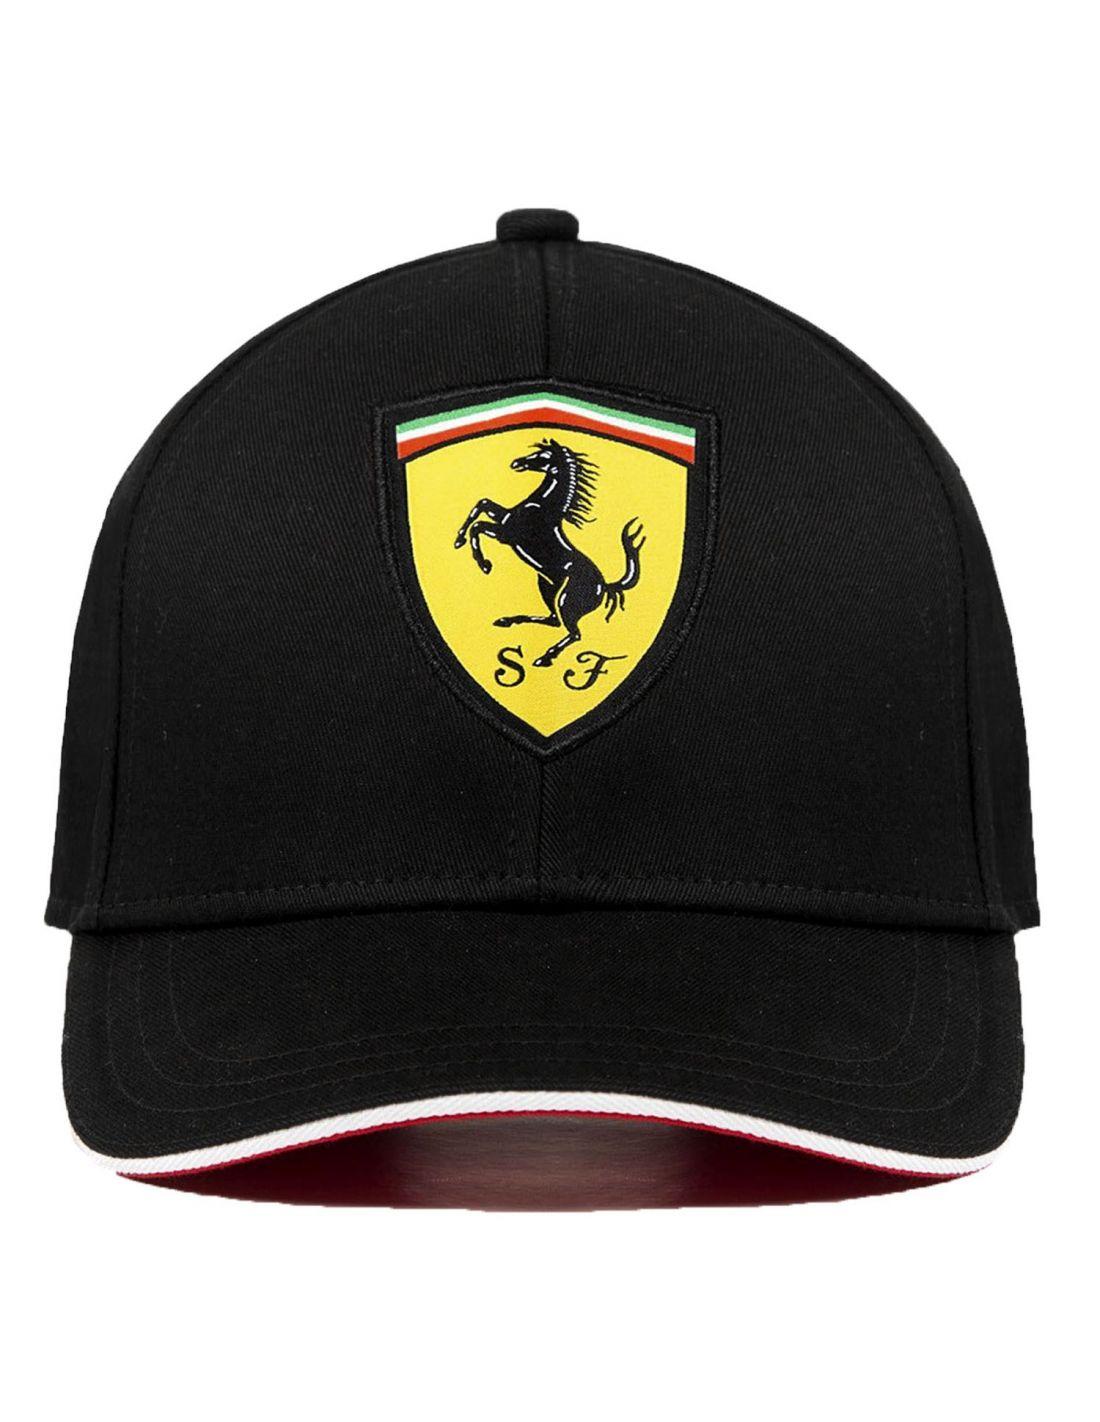 Ferrari Scuderia Baseball Cap Black